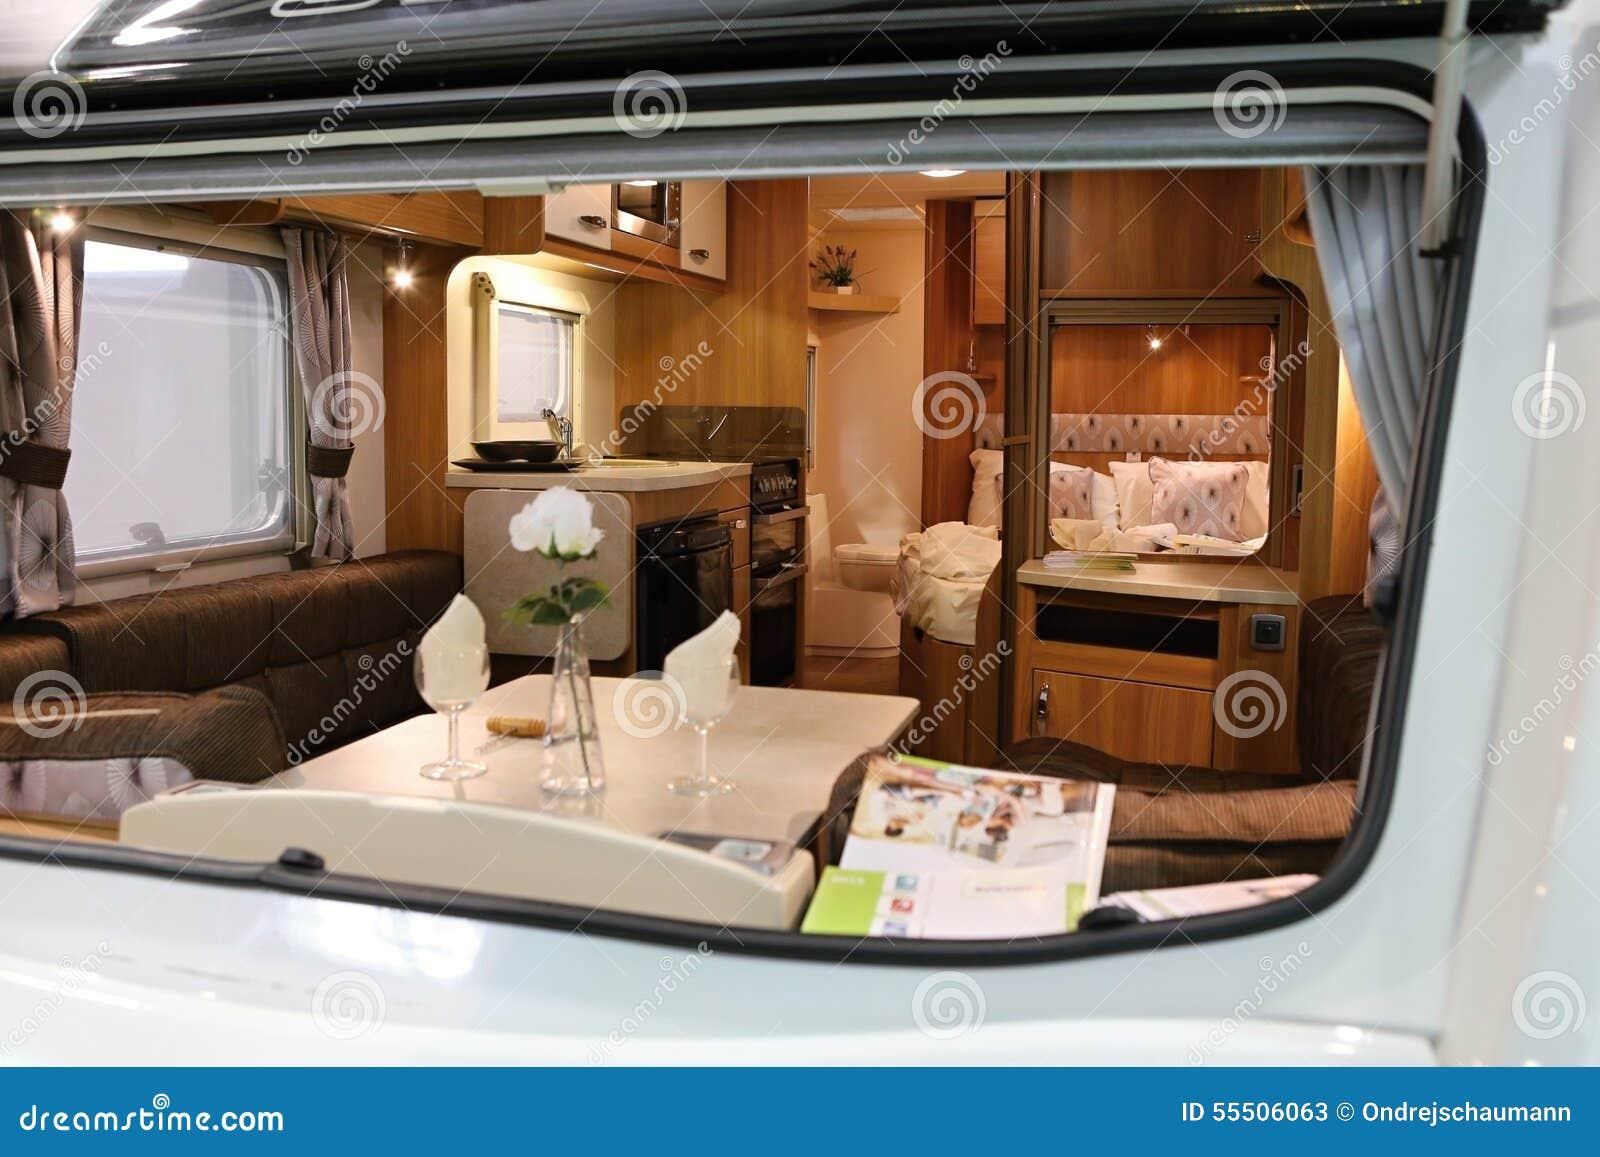 inside a mobile home inside a trailer park home inspiring home inside mobile home stock photo image 55506063 inside a mobile home home inside mobile inside mobile